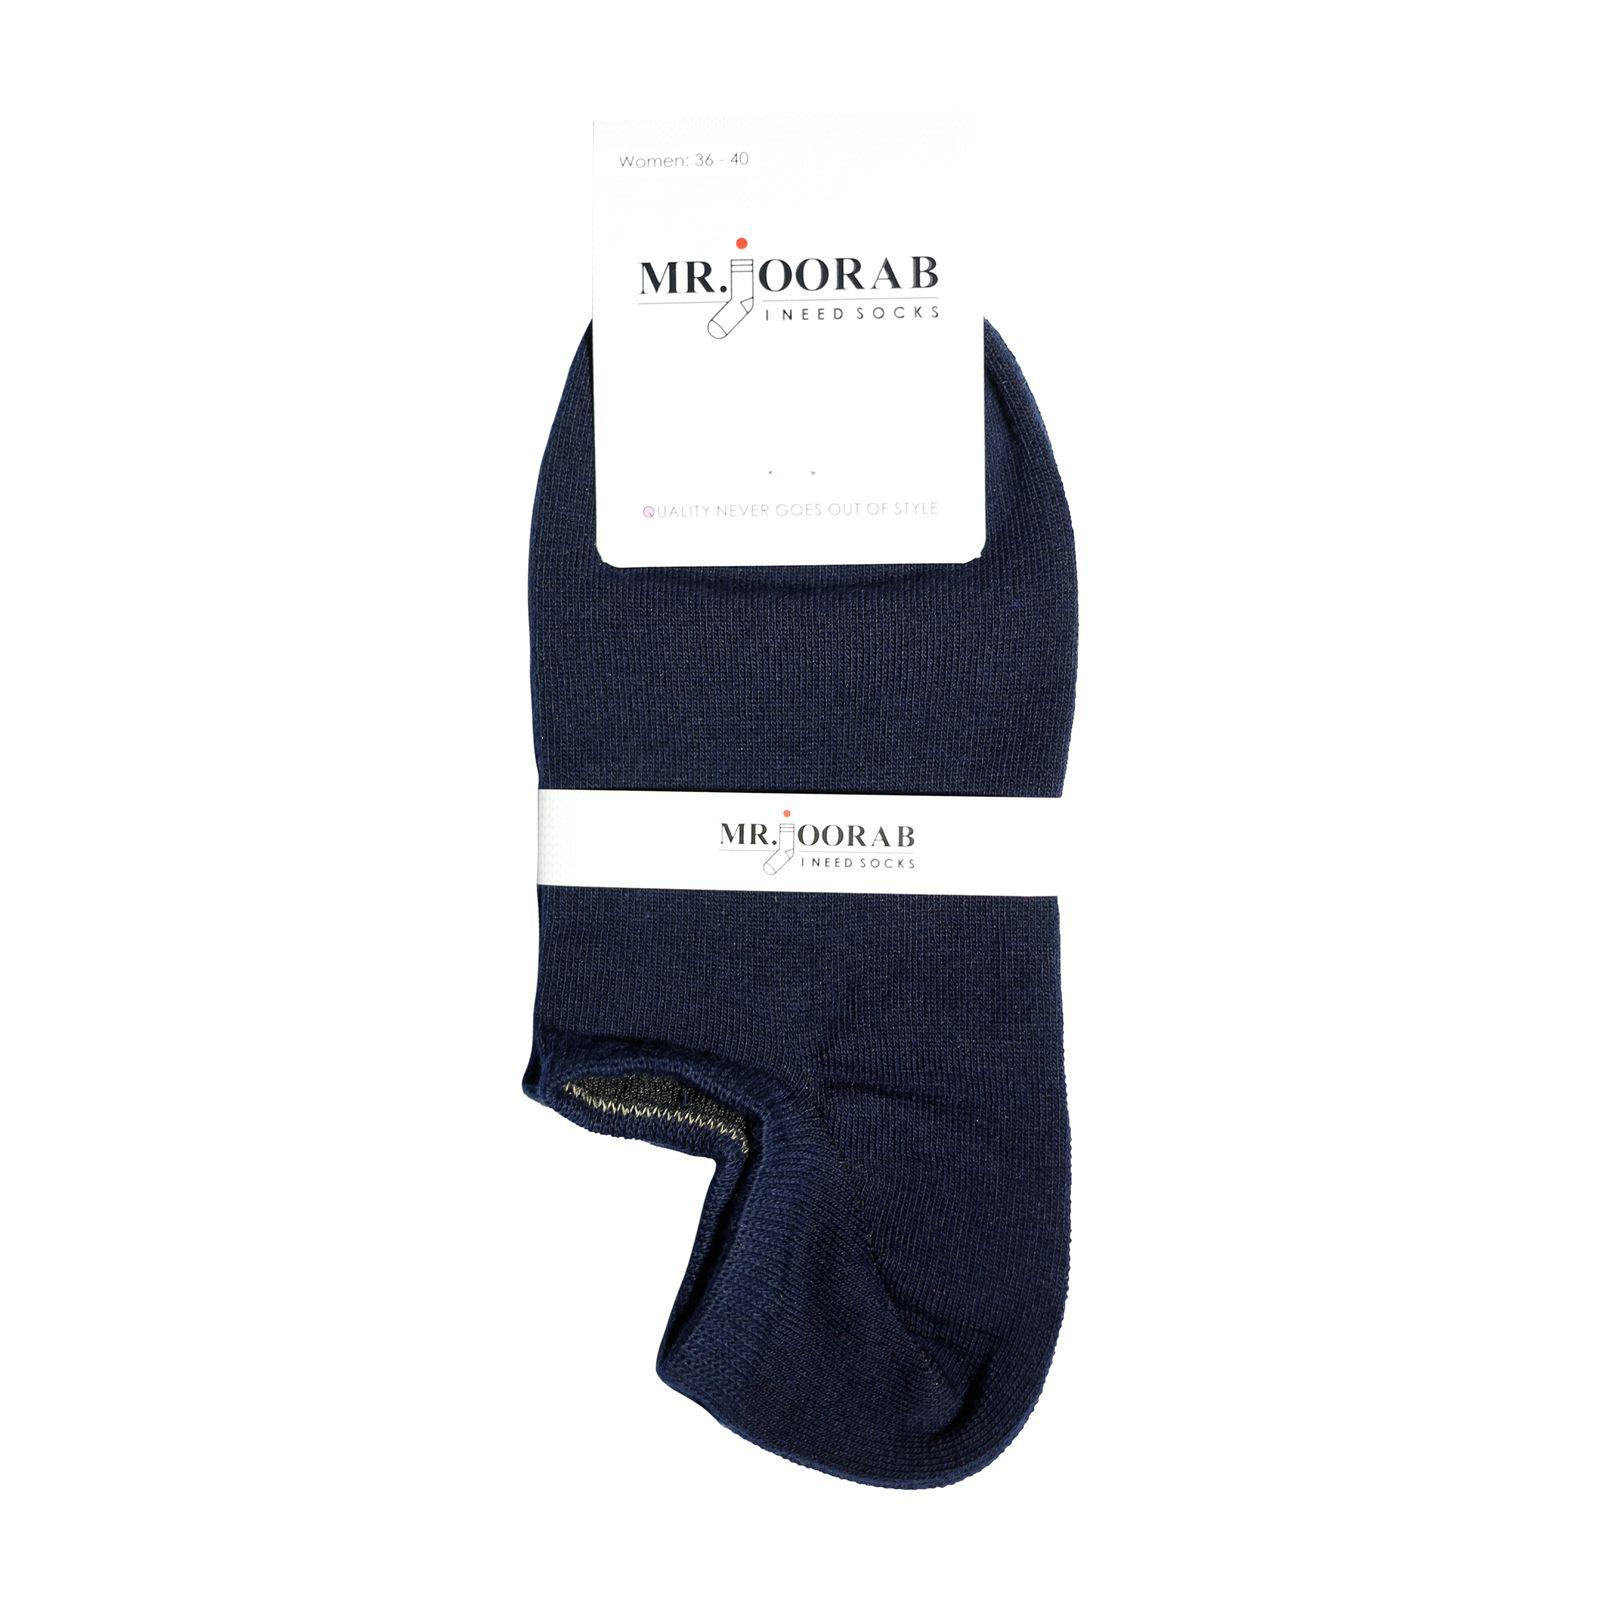 جوراب زنانه مستر جوراب کد BL-MRM 219 مجموعه 6 عددی -  - 4